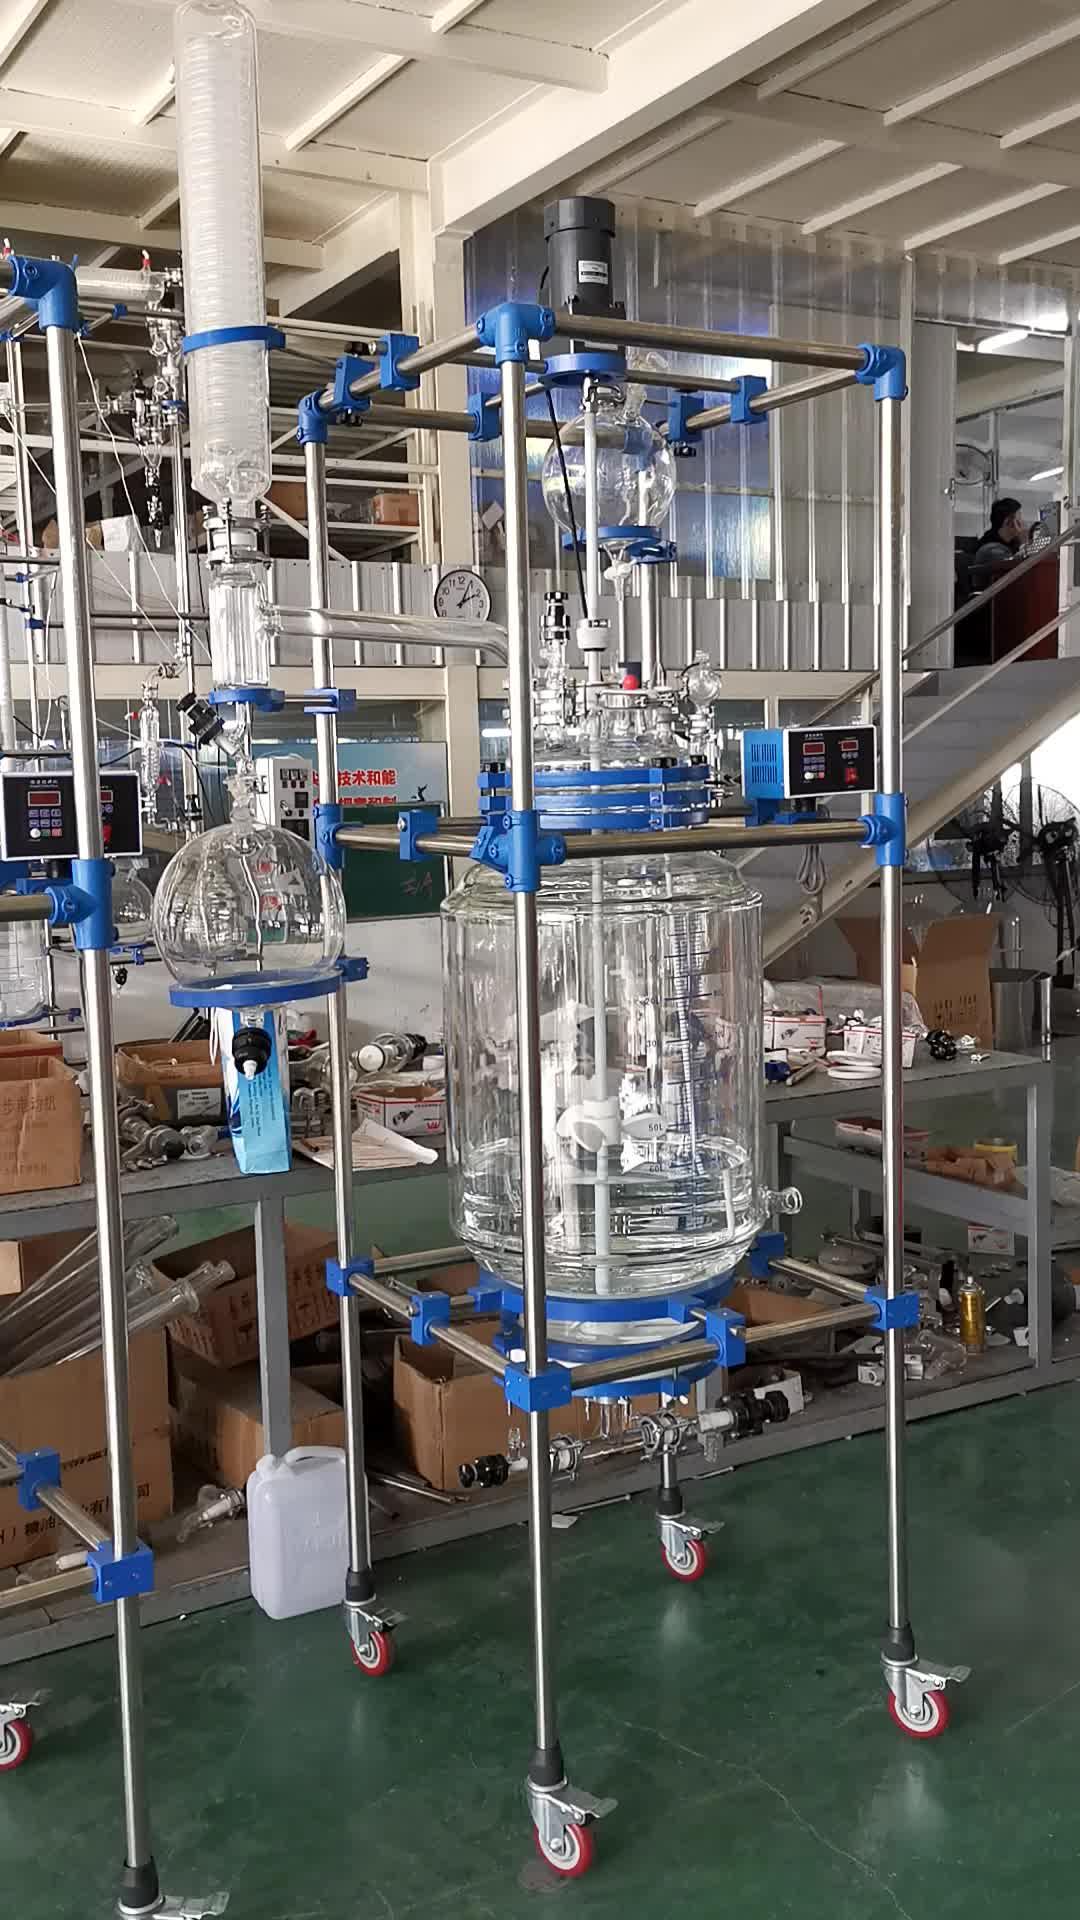 Tampa de Vidro de vidro-lin chemglass Jaqueta Reator 50l